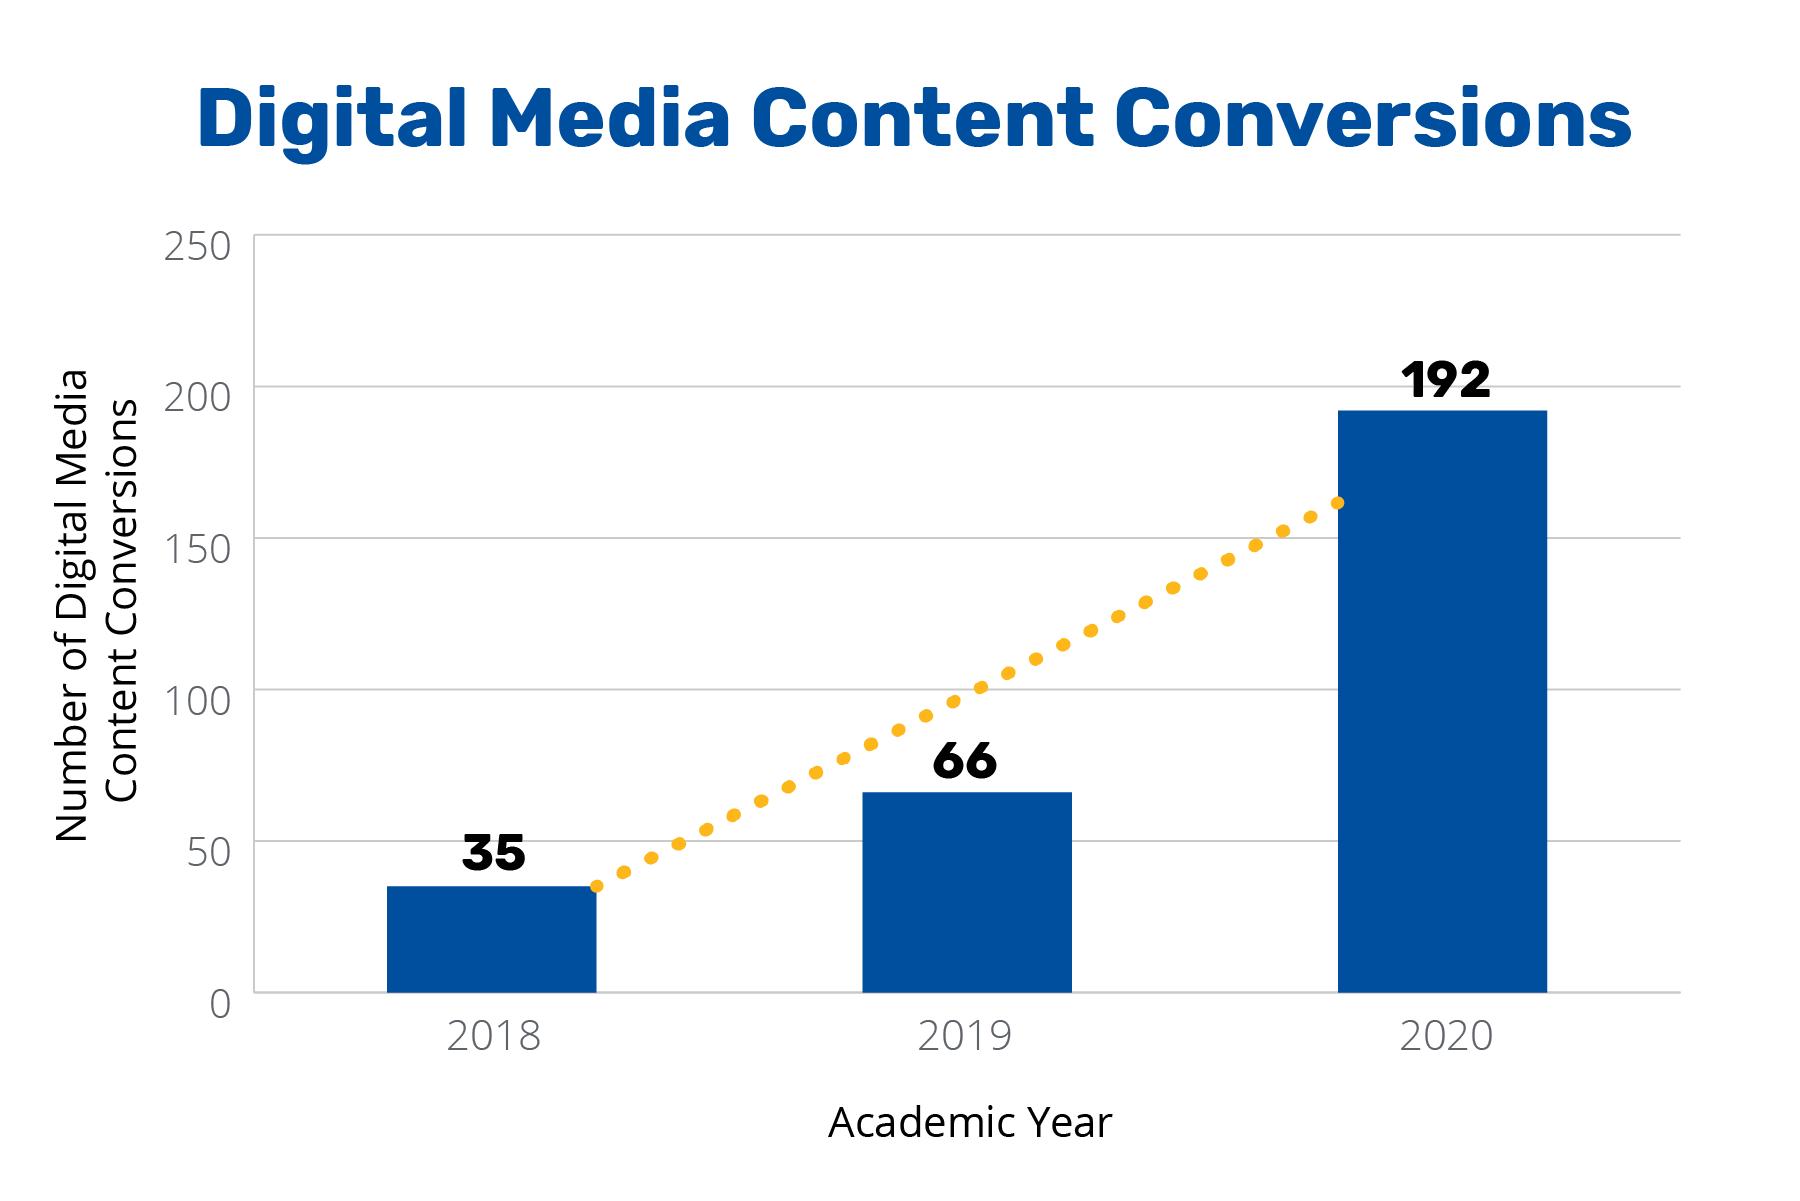 Annual Report 2020 - Digital Media Content Conversions